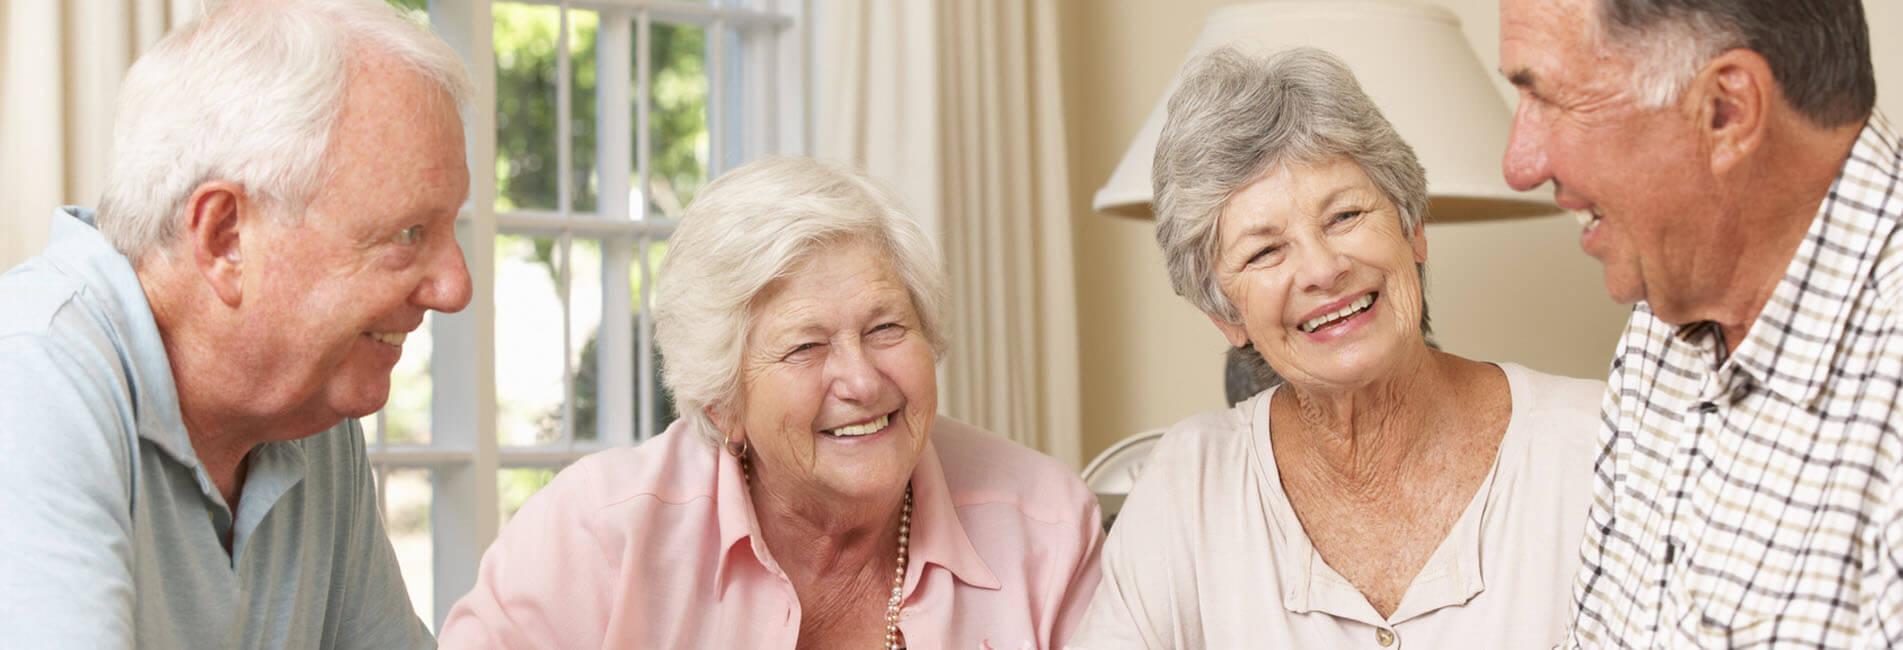 Elderly Friends Laughing